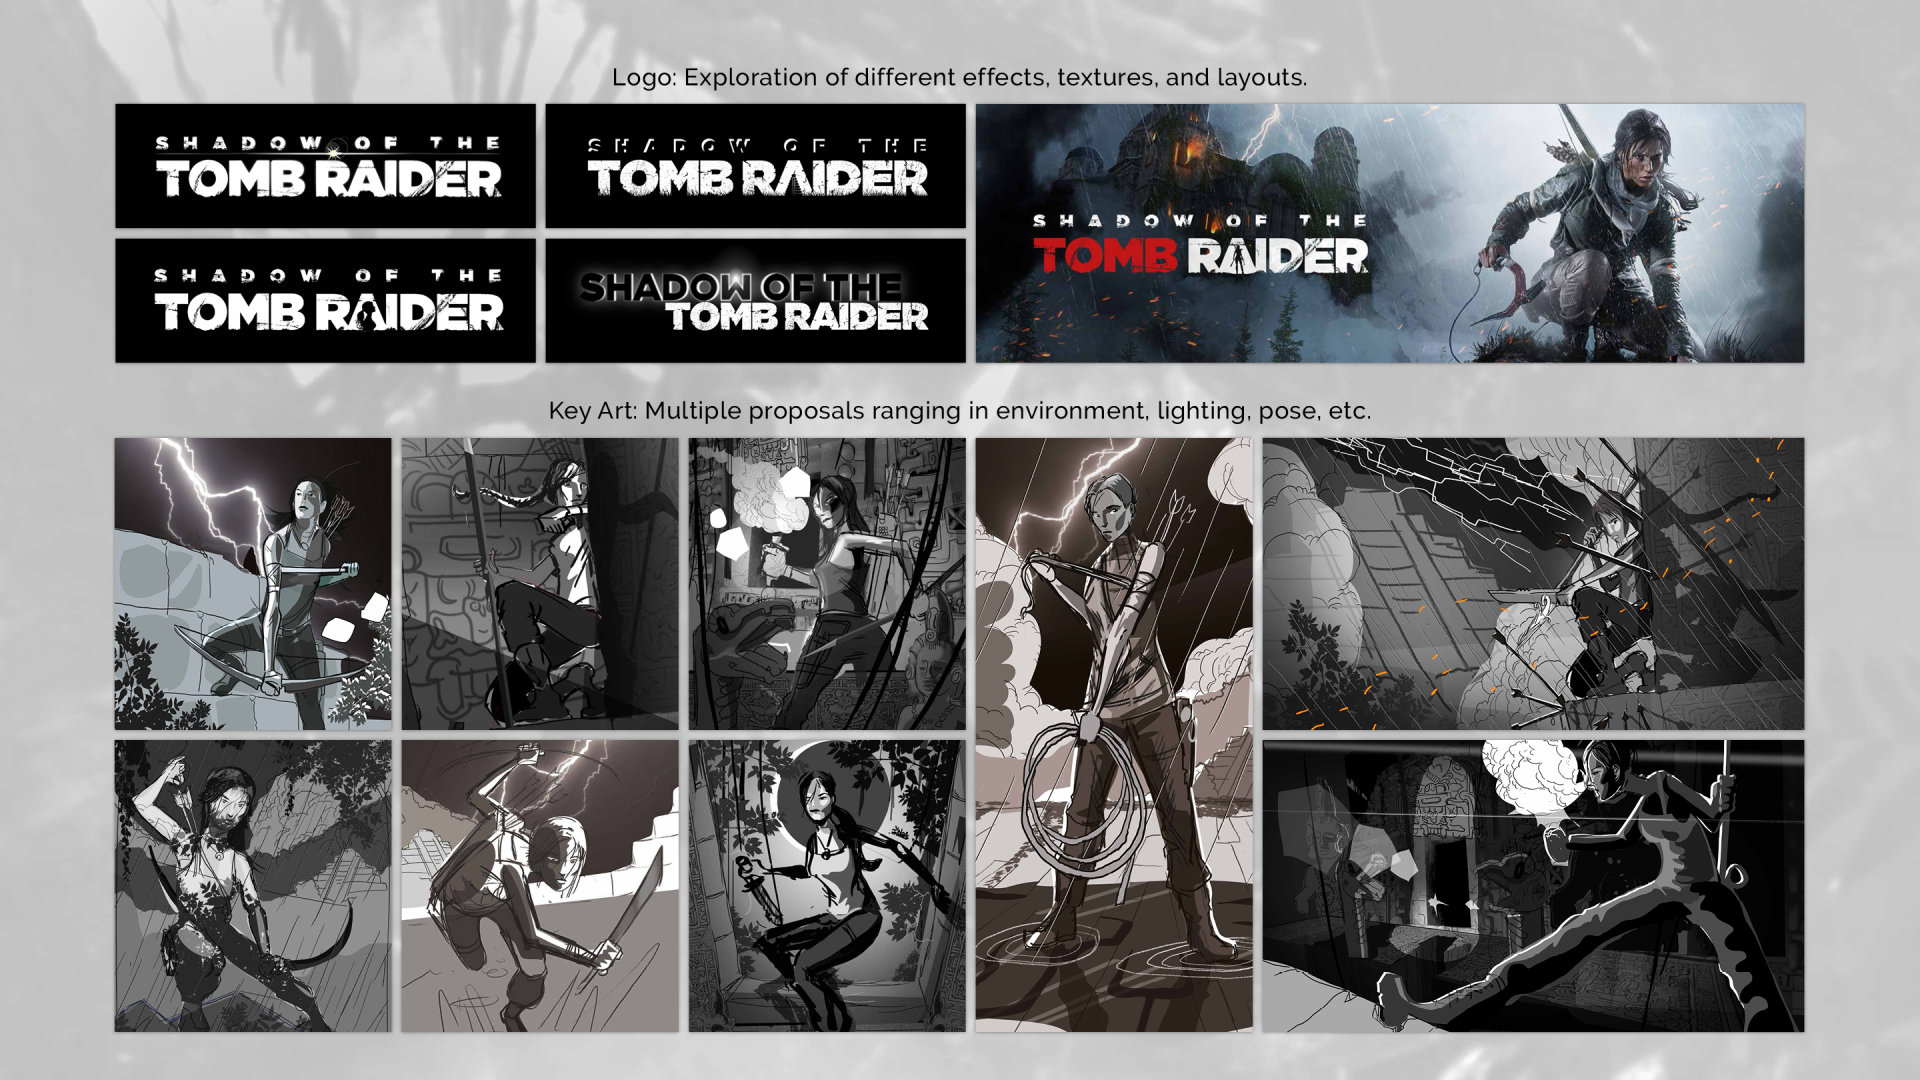 shadow-of-the-tomb-raider-artwork.jpg